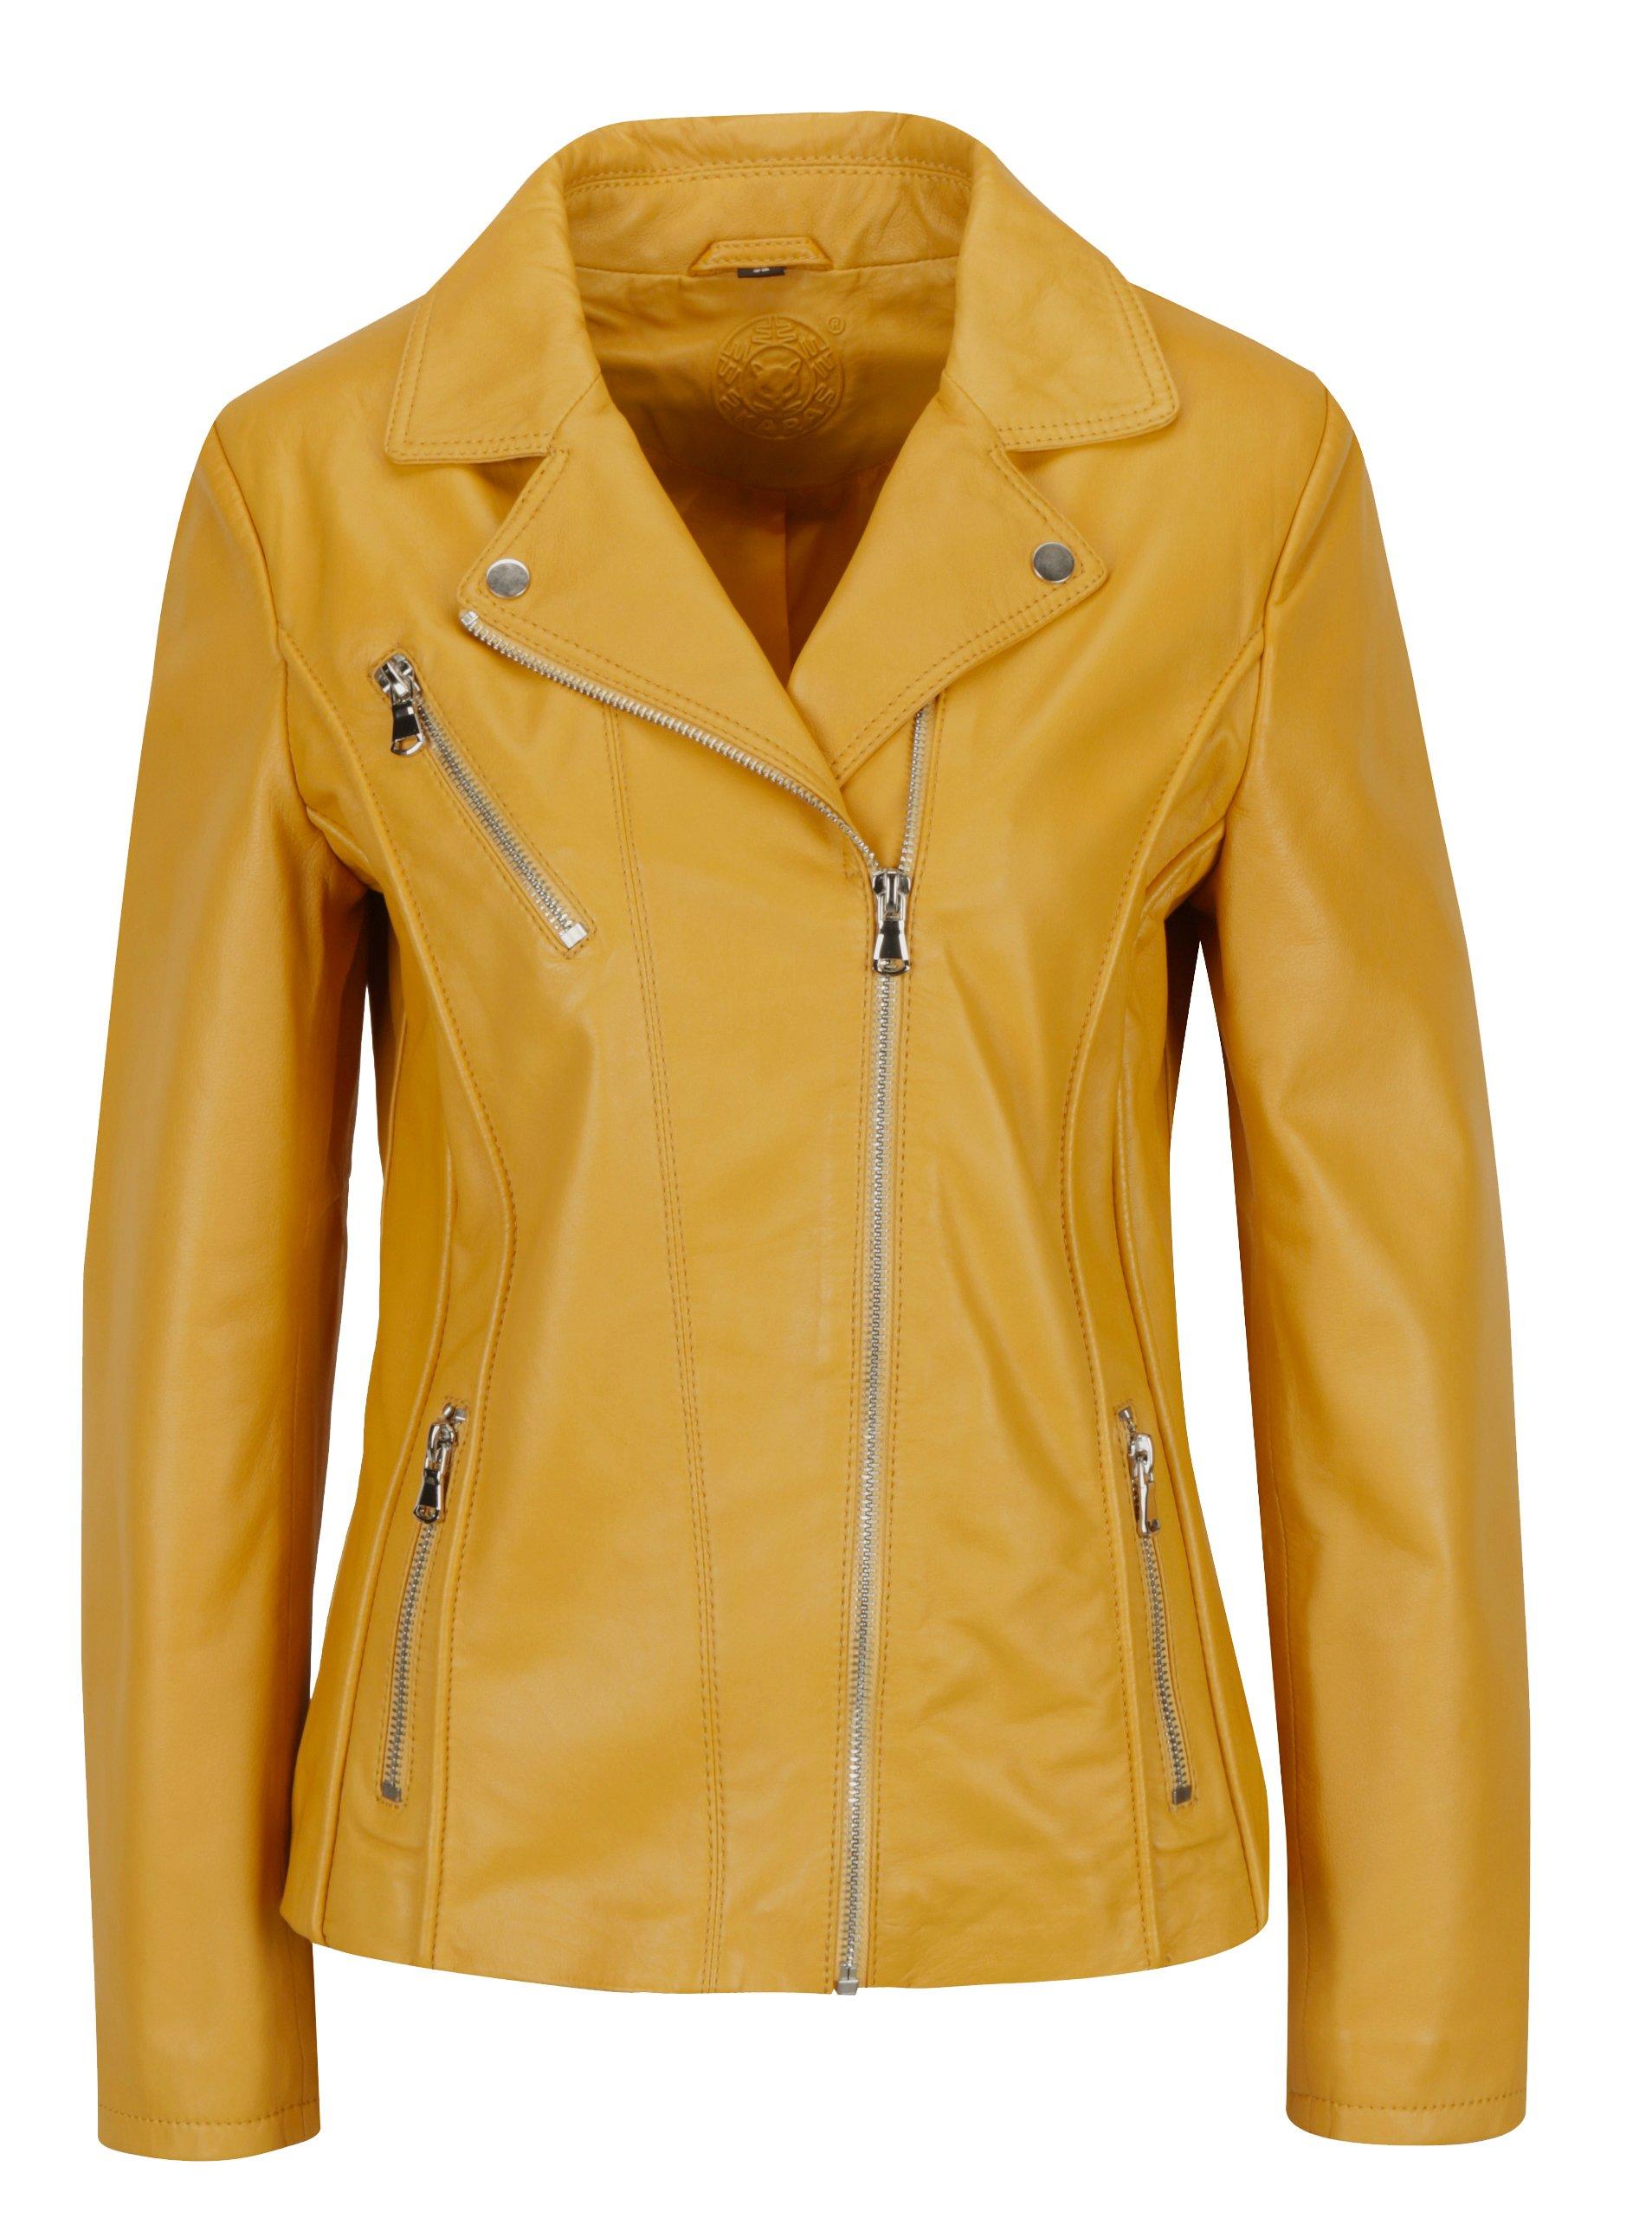 Žlutý dámský kožený křivák KARA Kenya